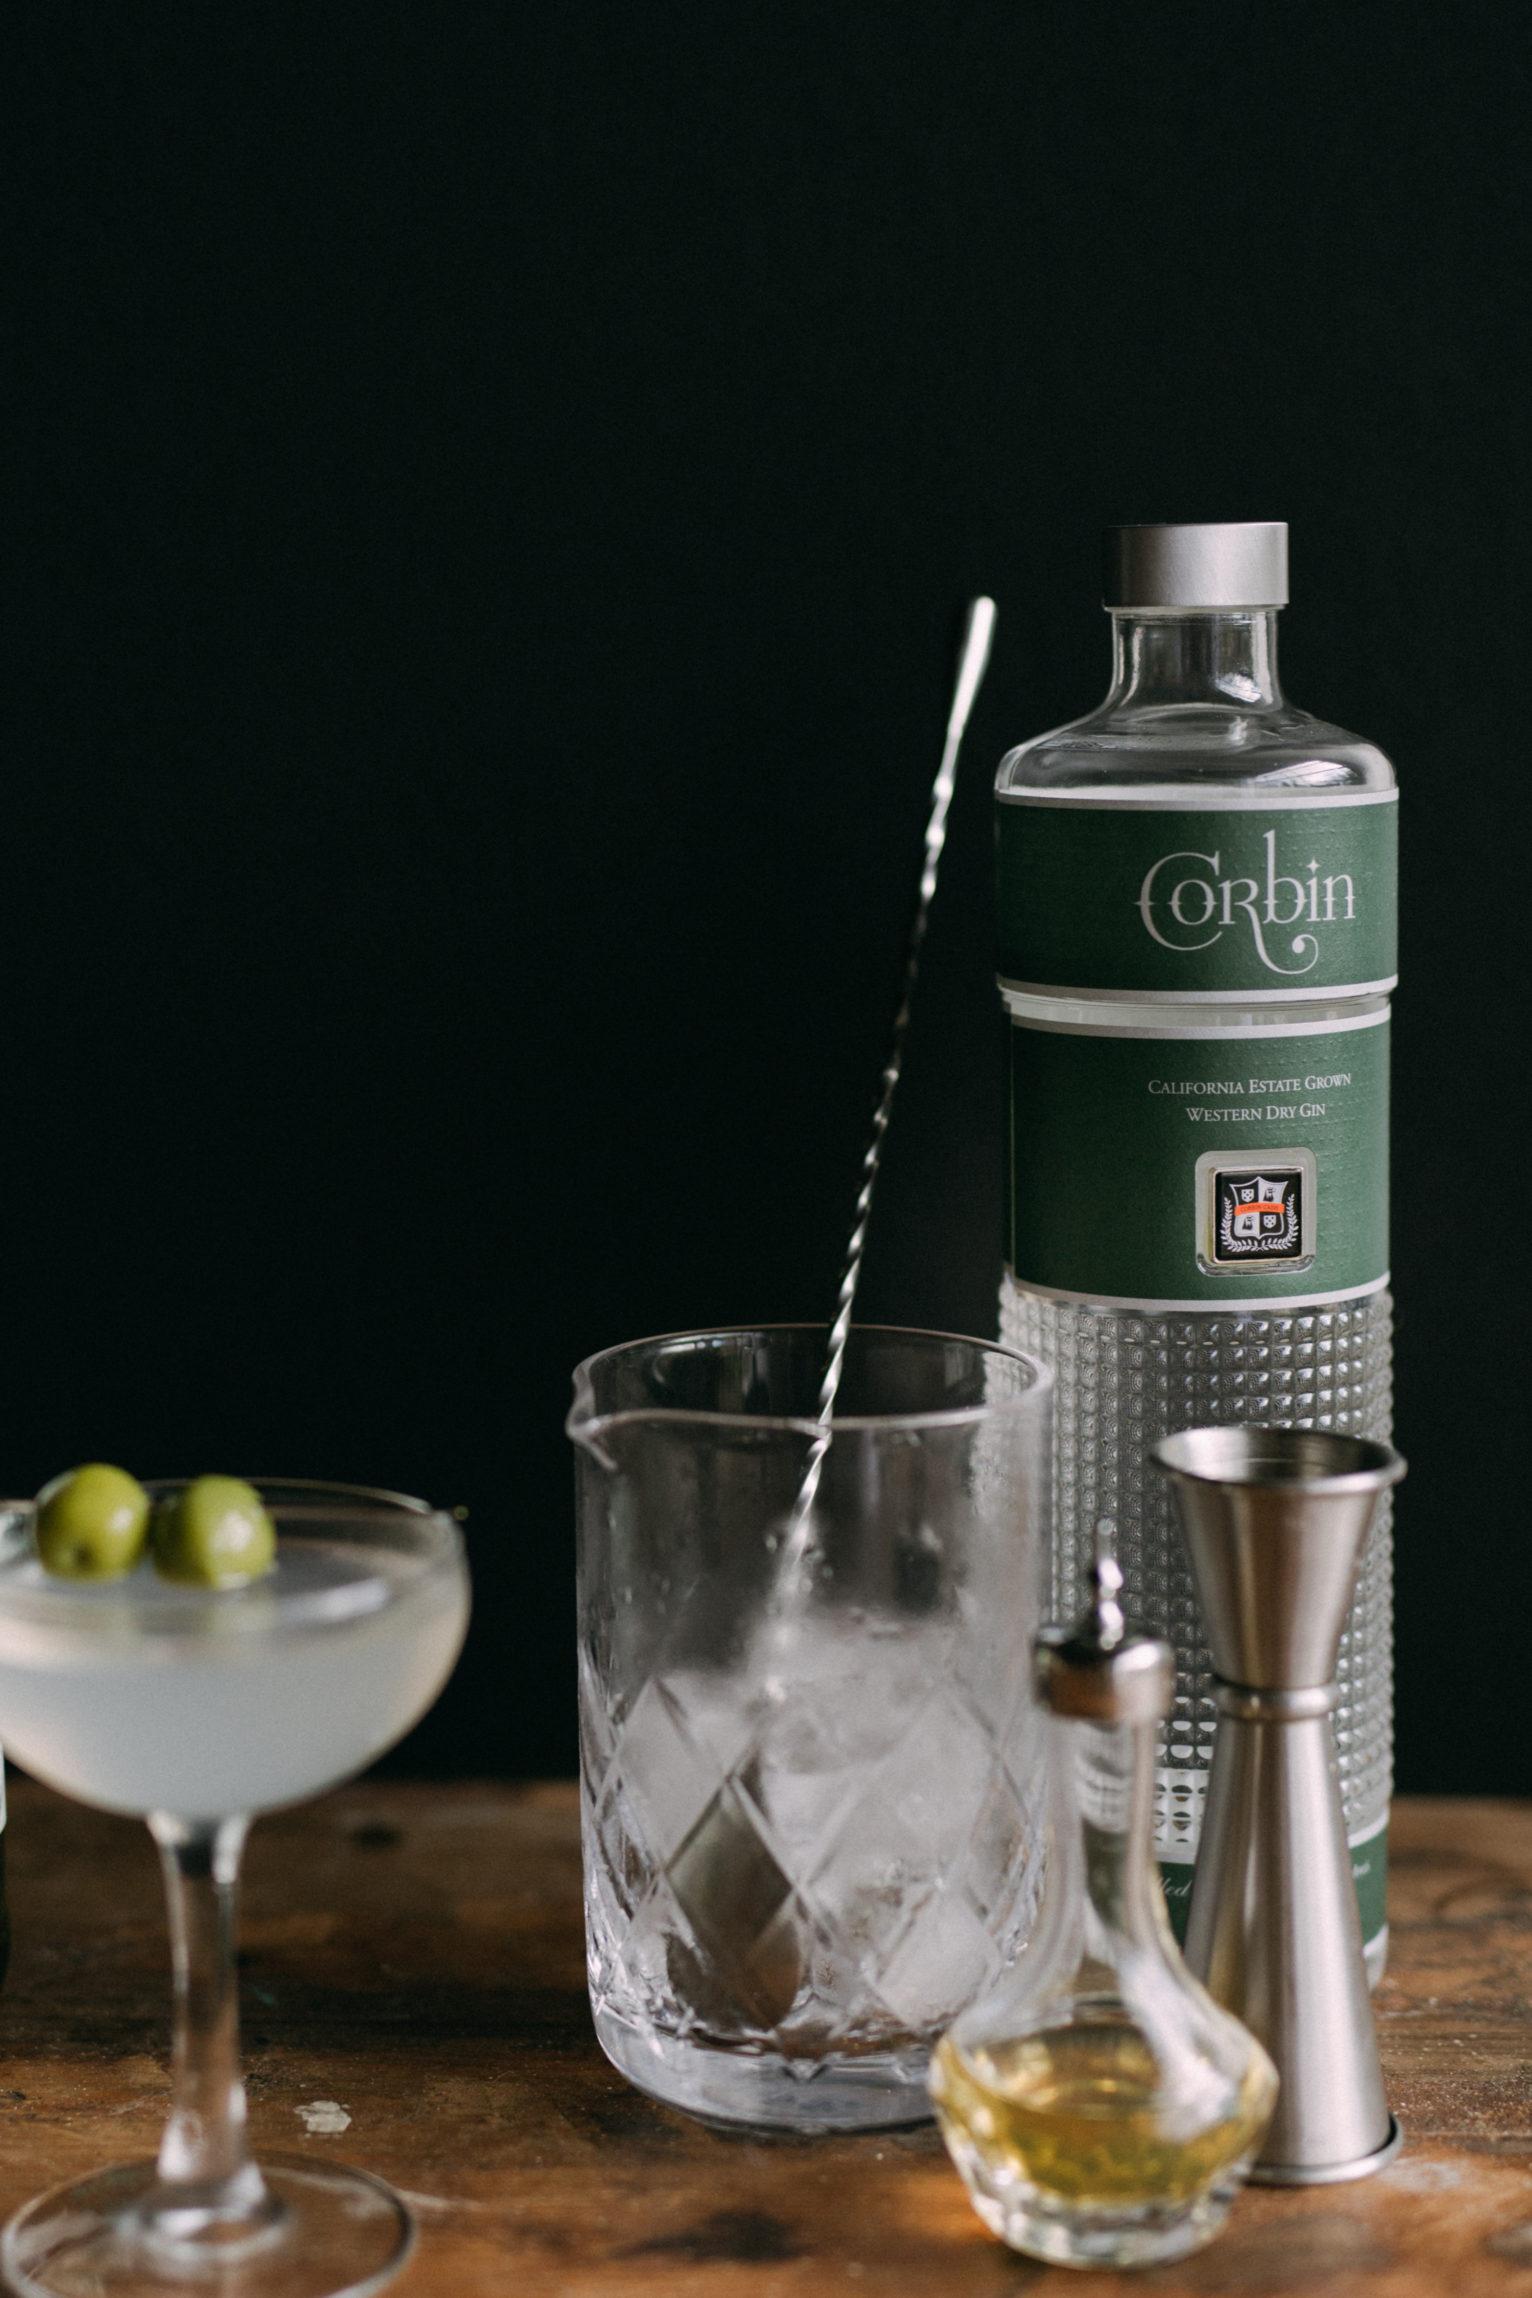 Dolin Dry Vermouth, Martini Glass, Bitters Bottle, Jigger, Corbin Gin